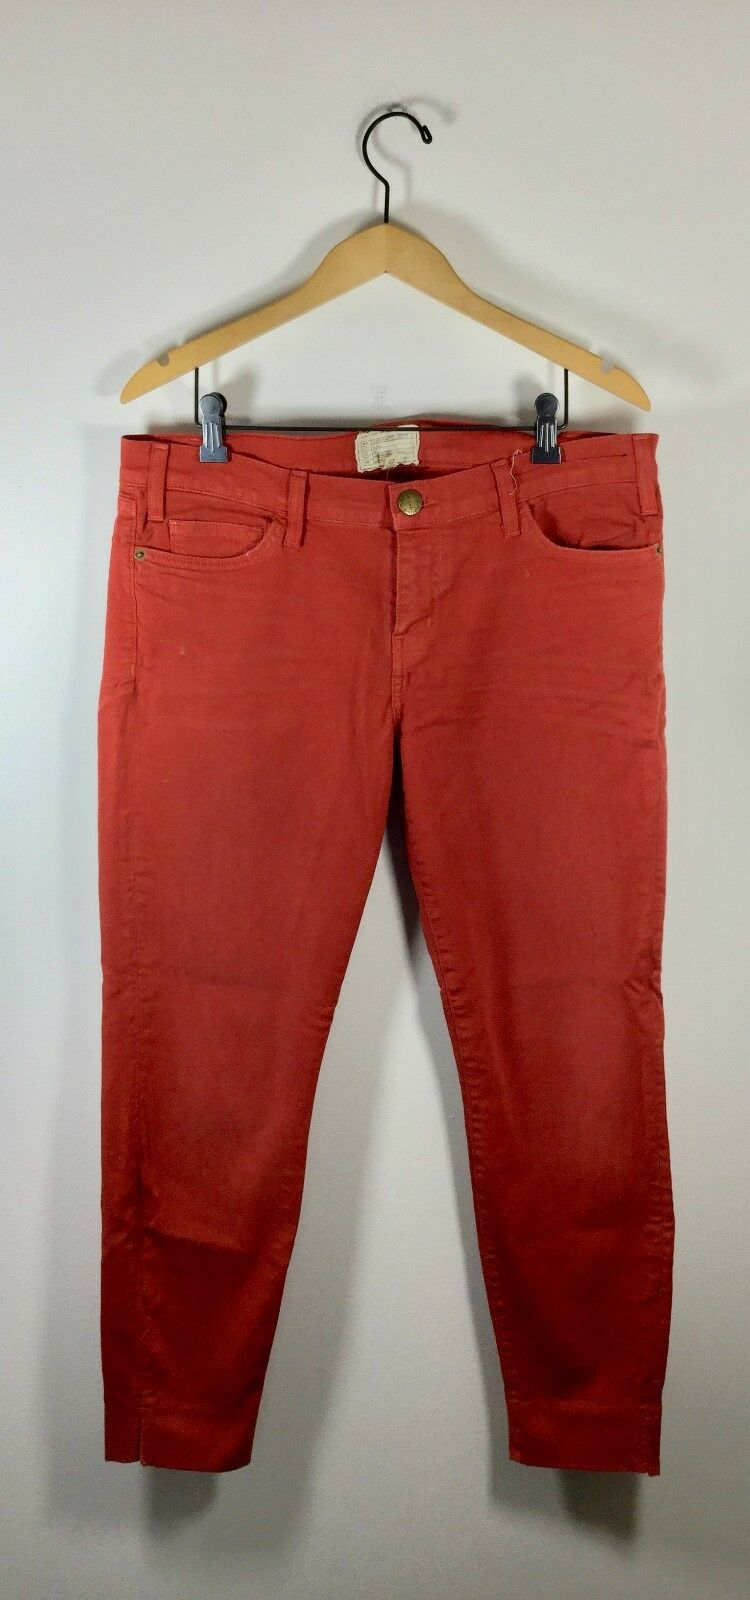 CURRENT ELLIOTT Paprika orange Size 32 Slit Stiletto Skinny Leg Pant Jeans